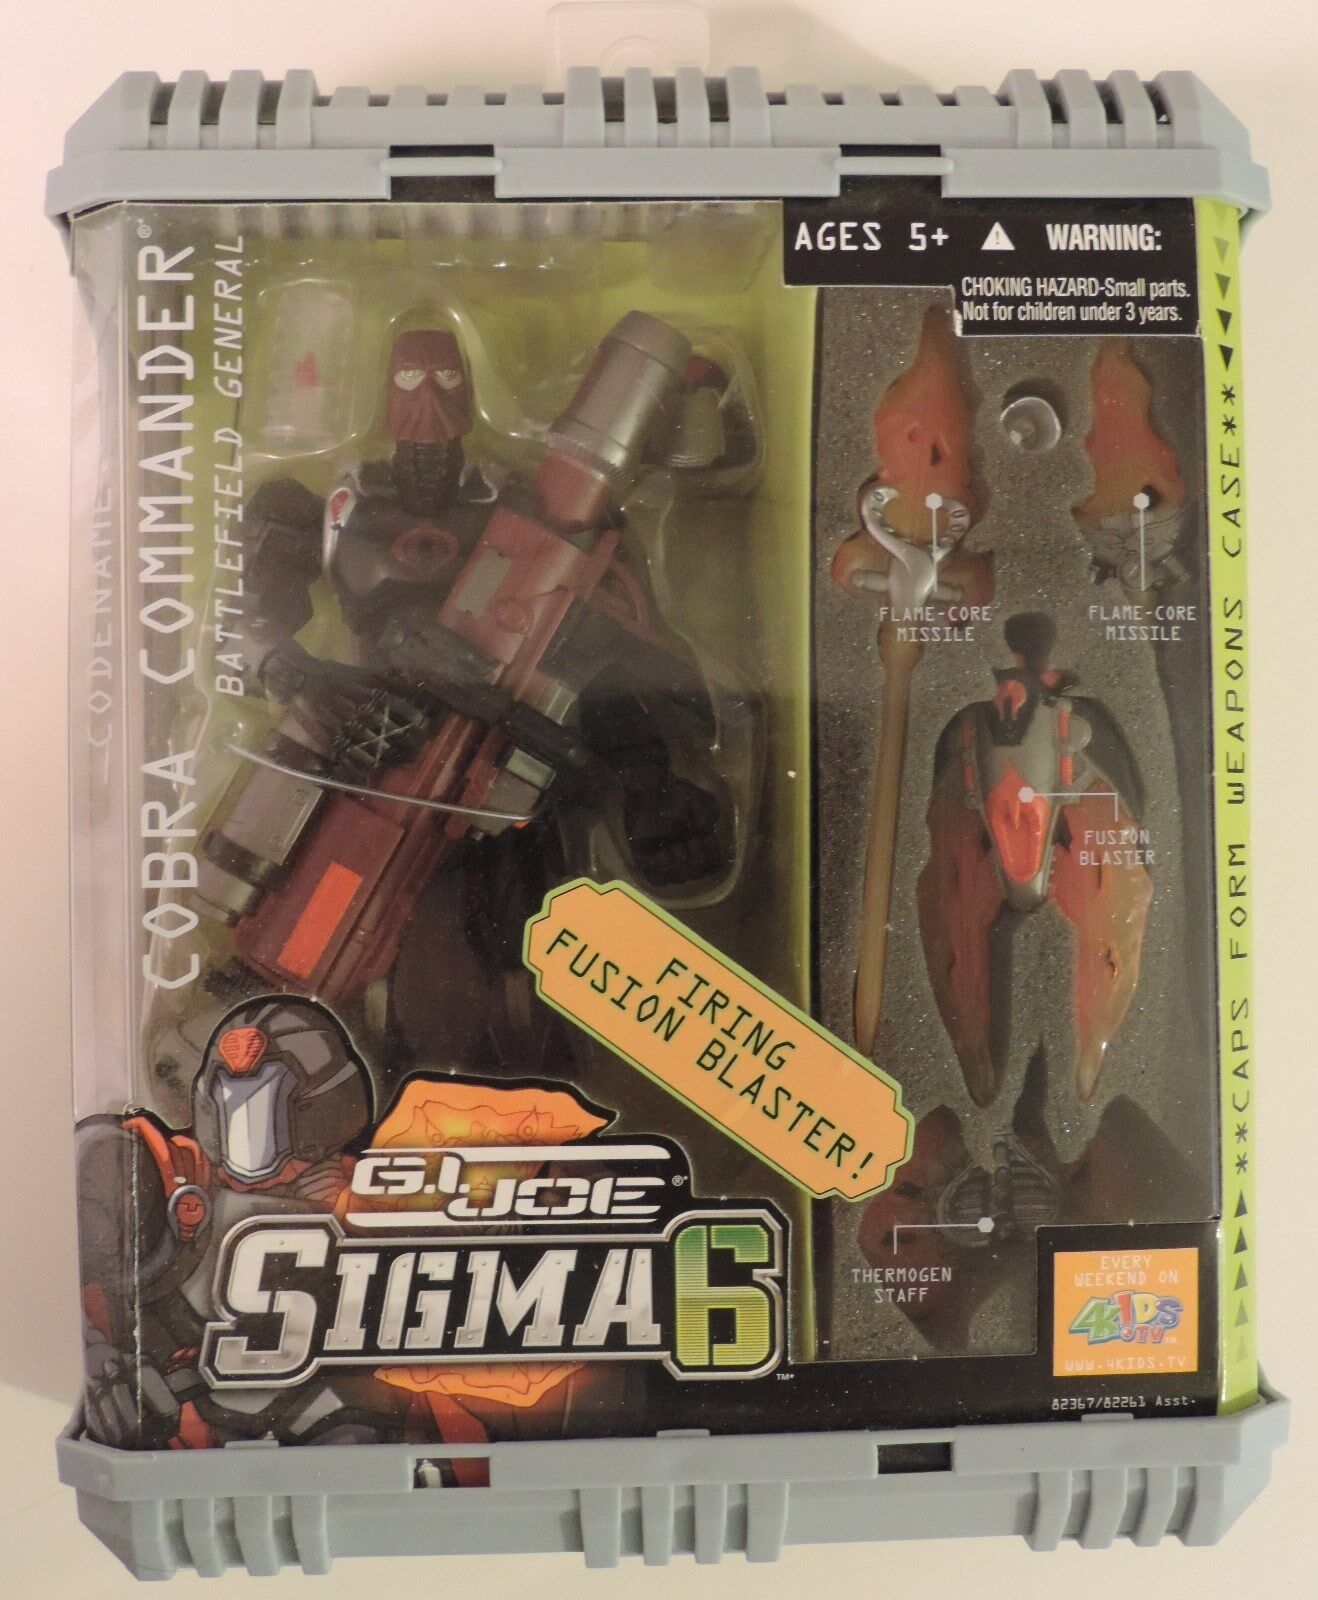 GI Joe 6 Sigma 6 Joe Cobra Commander Battlefield General 8  action figure - New 0b48e4